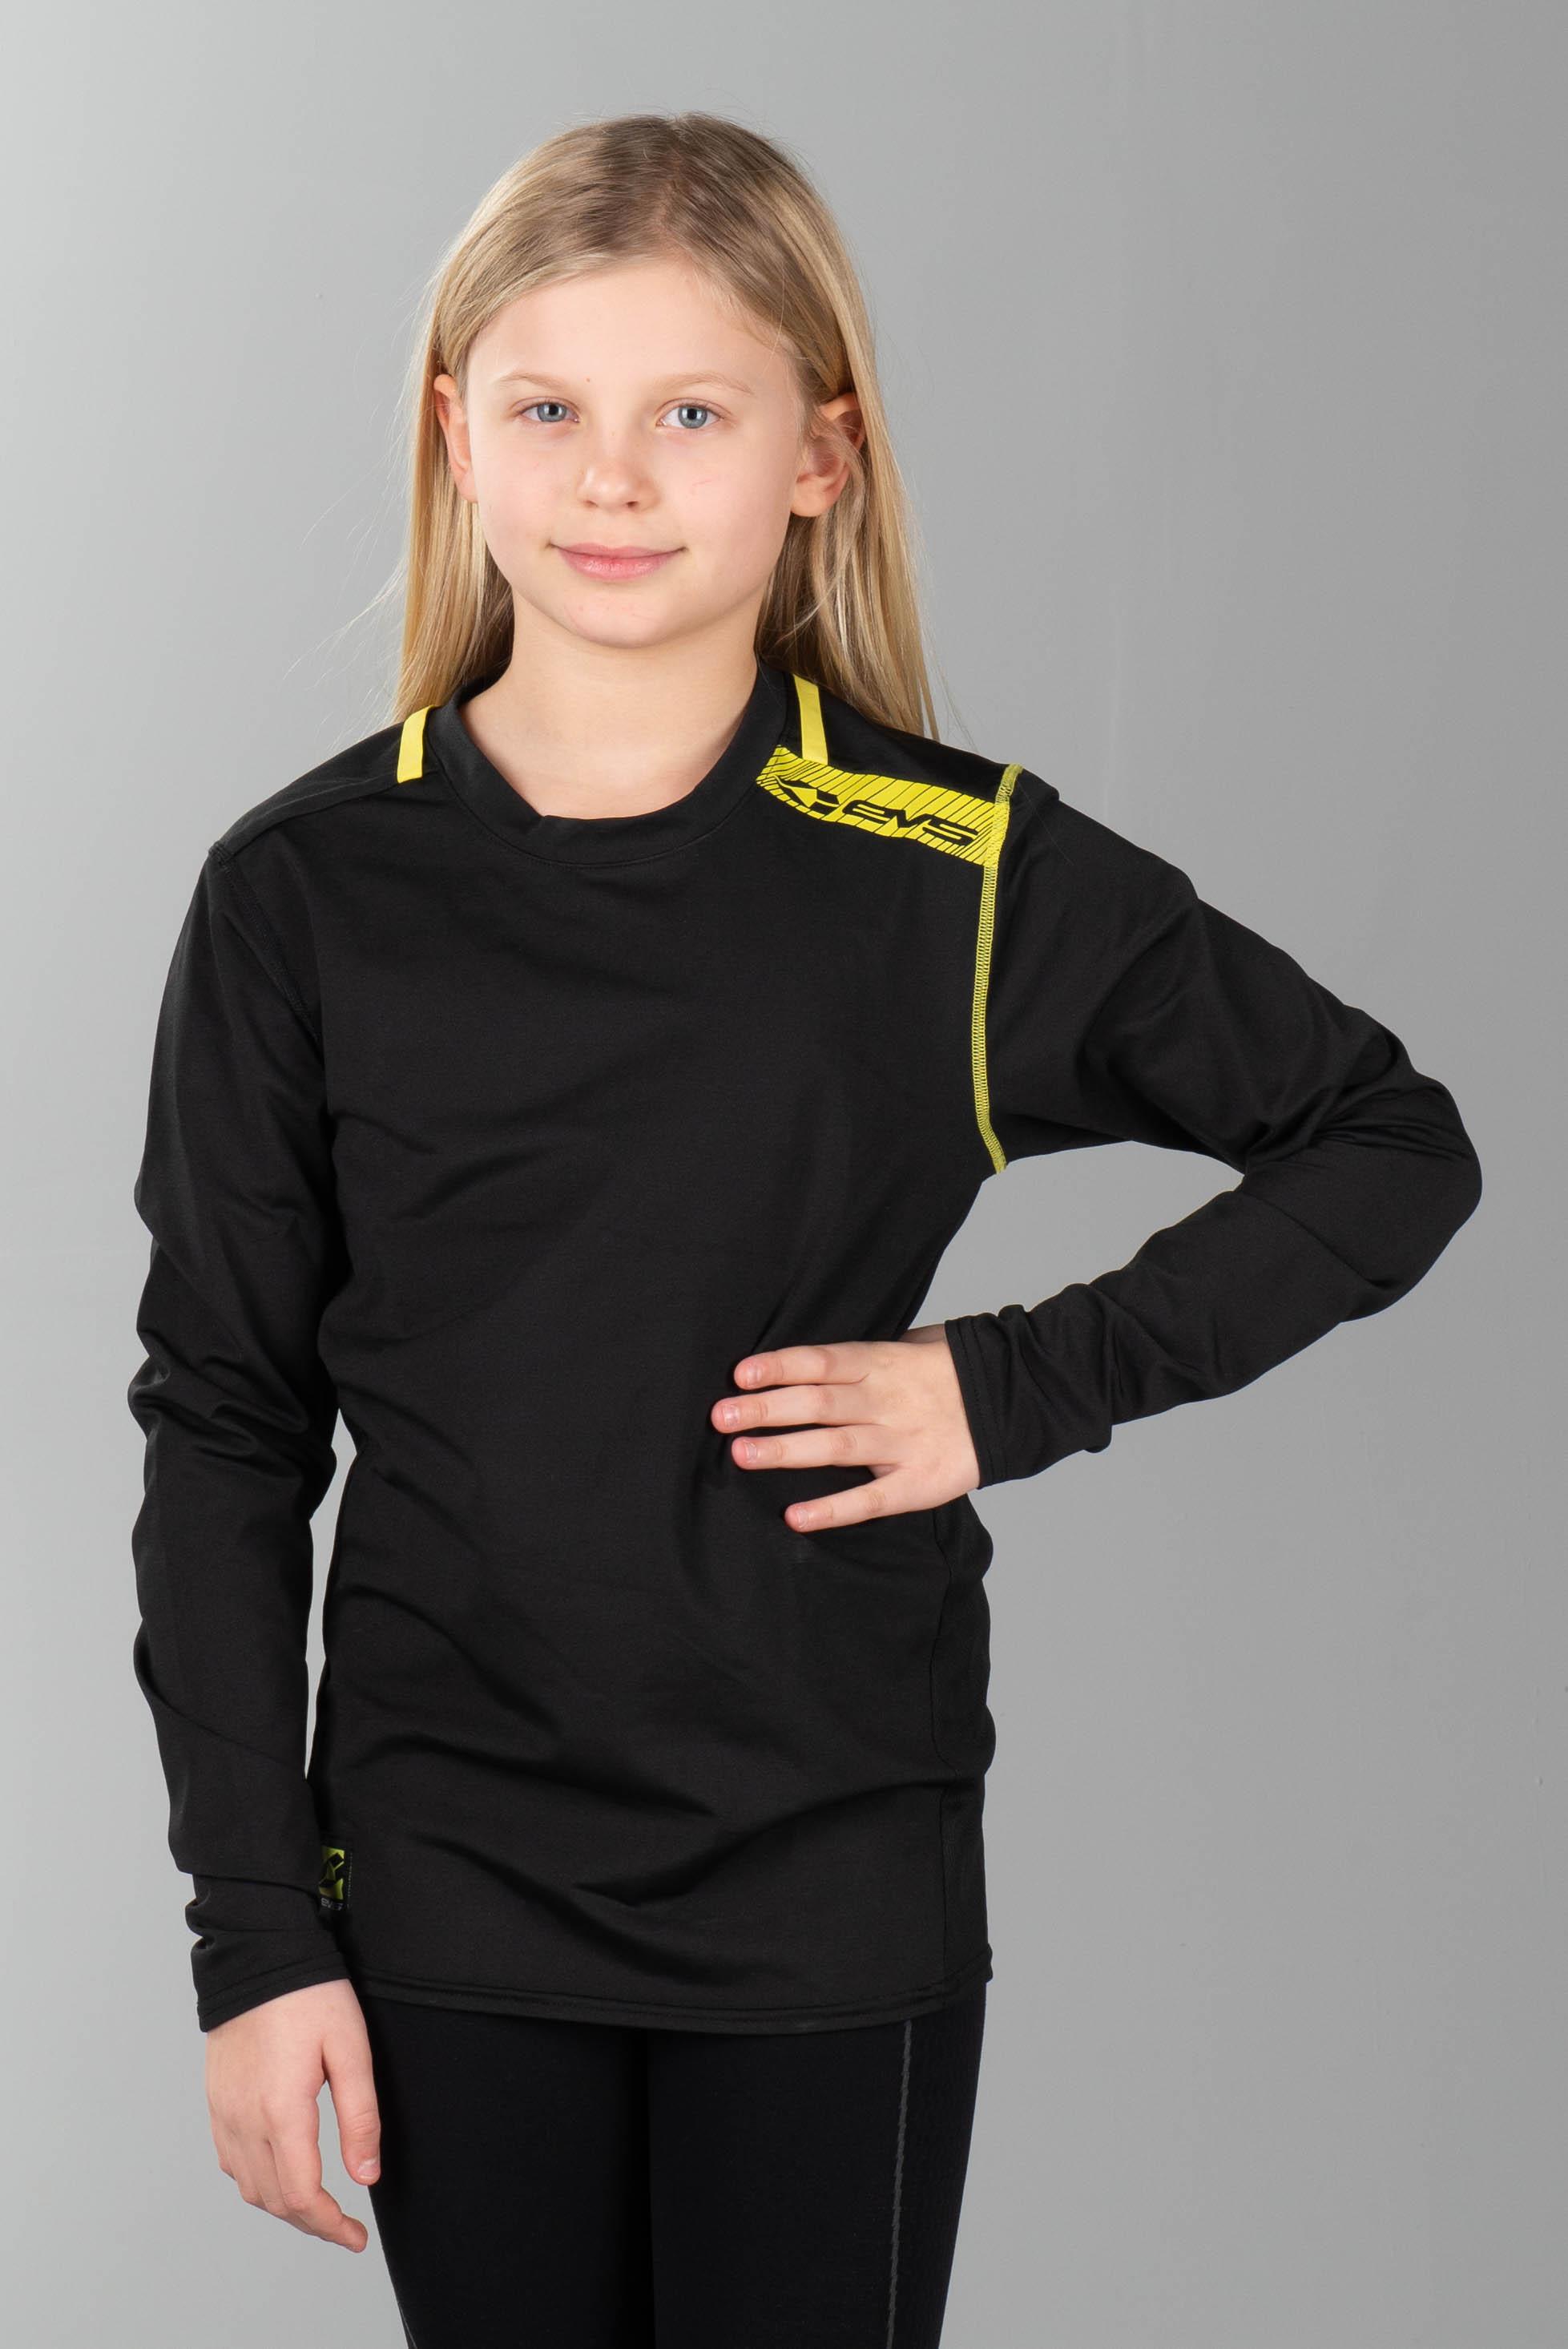 EVS Sports Unisex-Child Tug Top No Sleeve Black Small